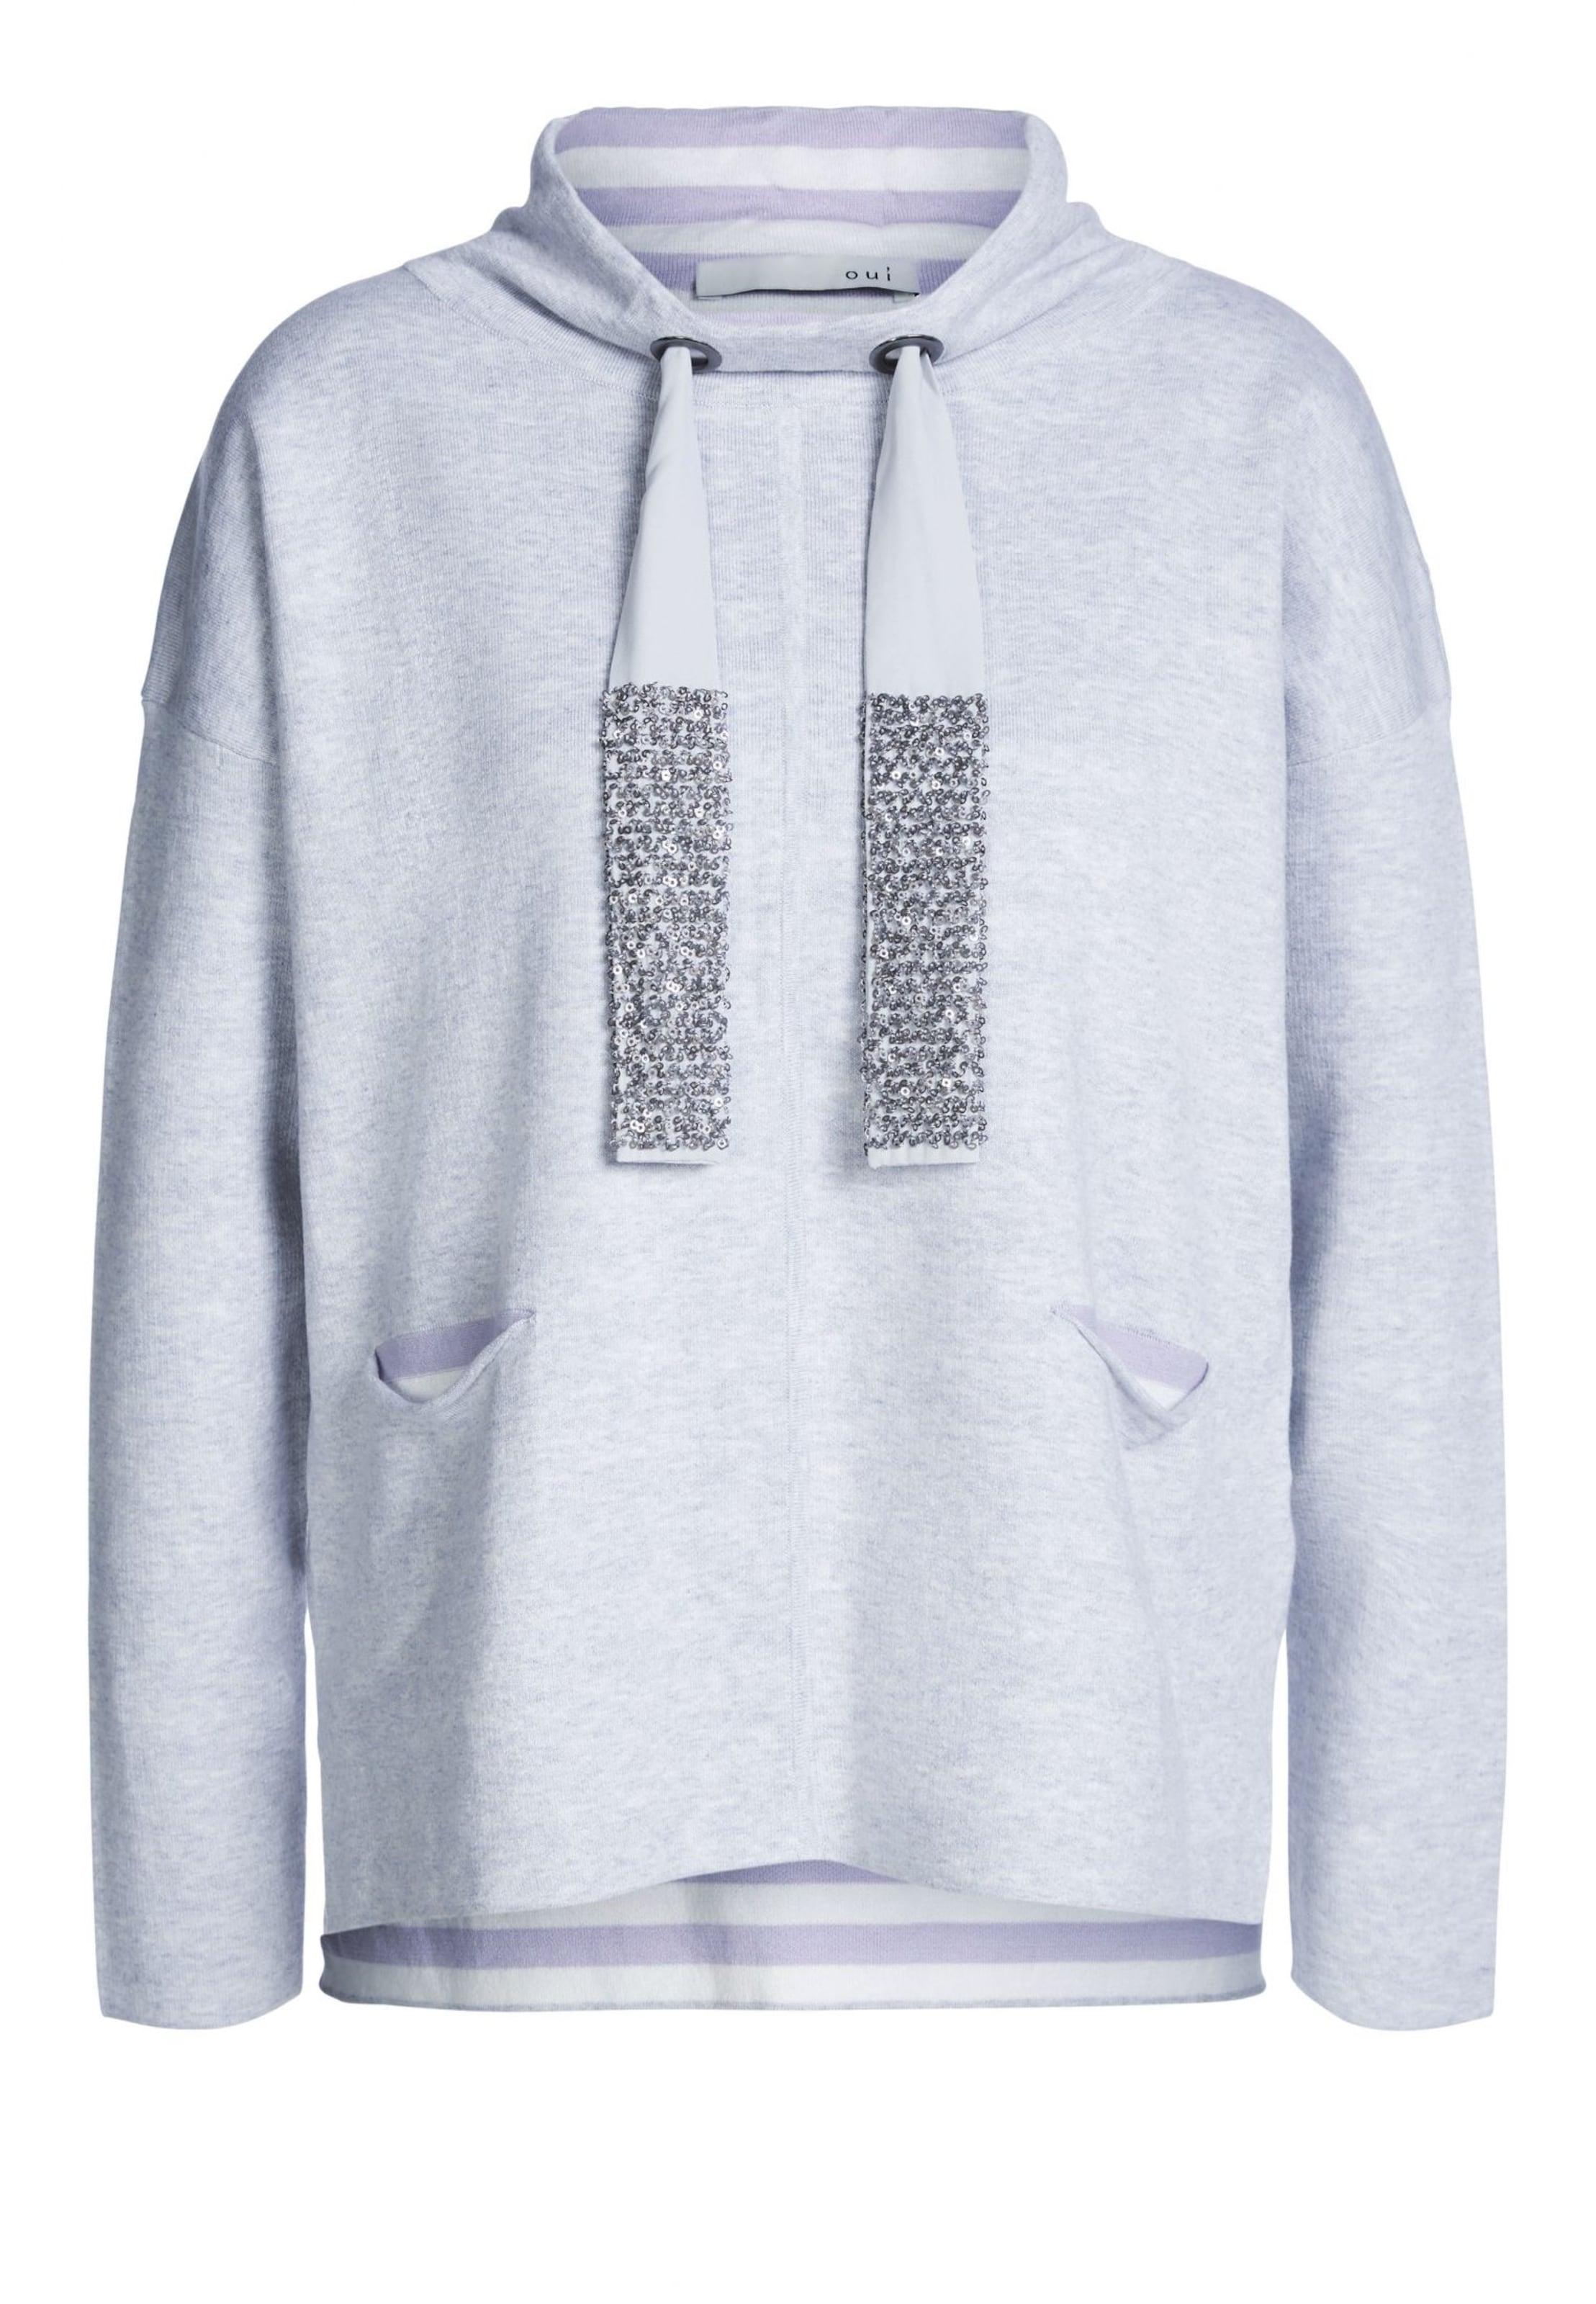 Graumeliert Pullover Pullover Oui In Oui lFKuJ5T13c